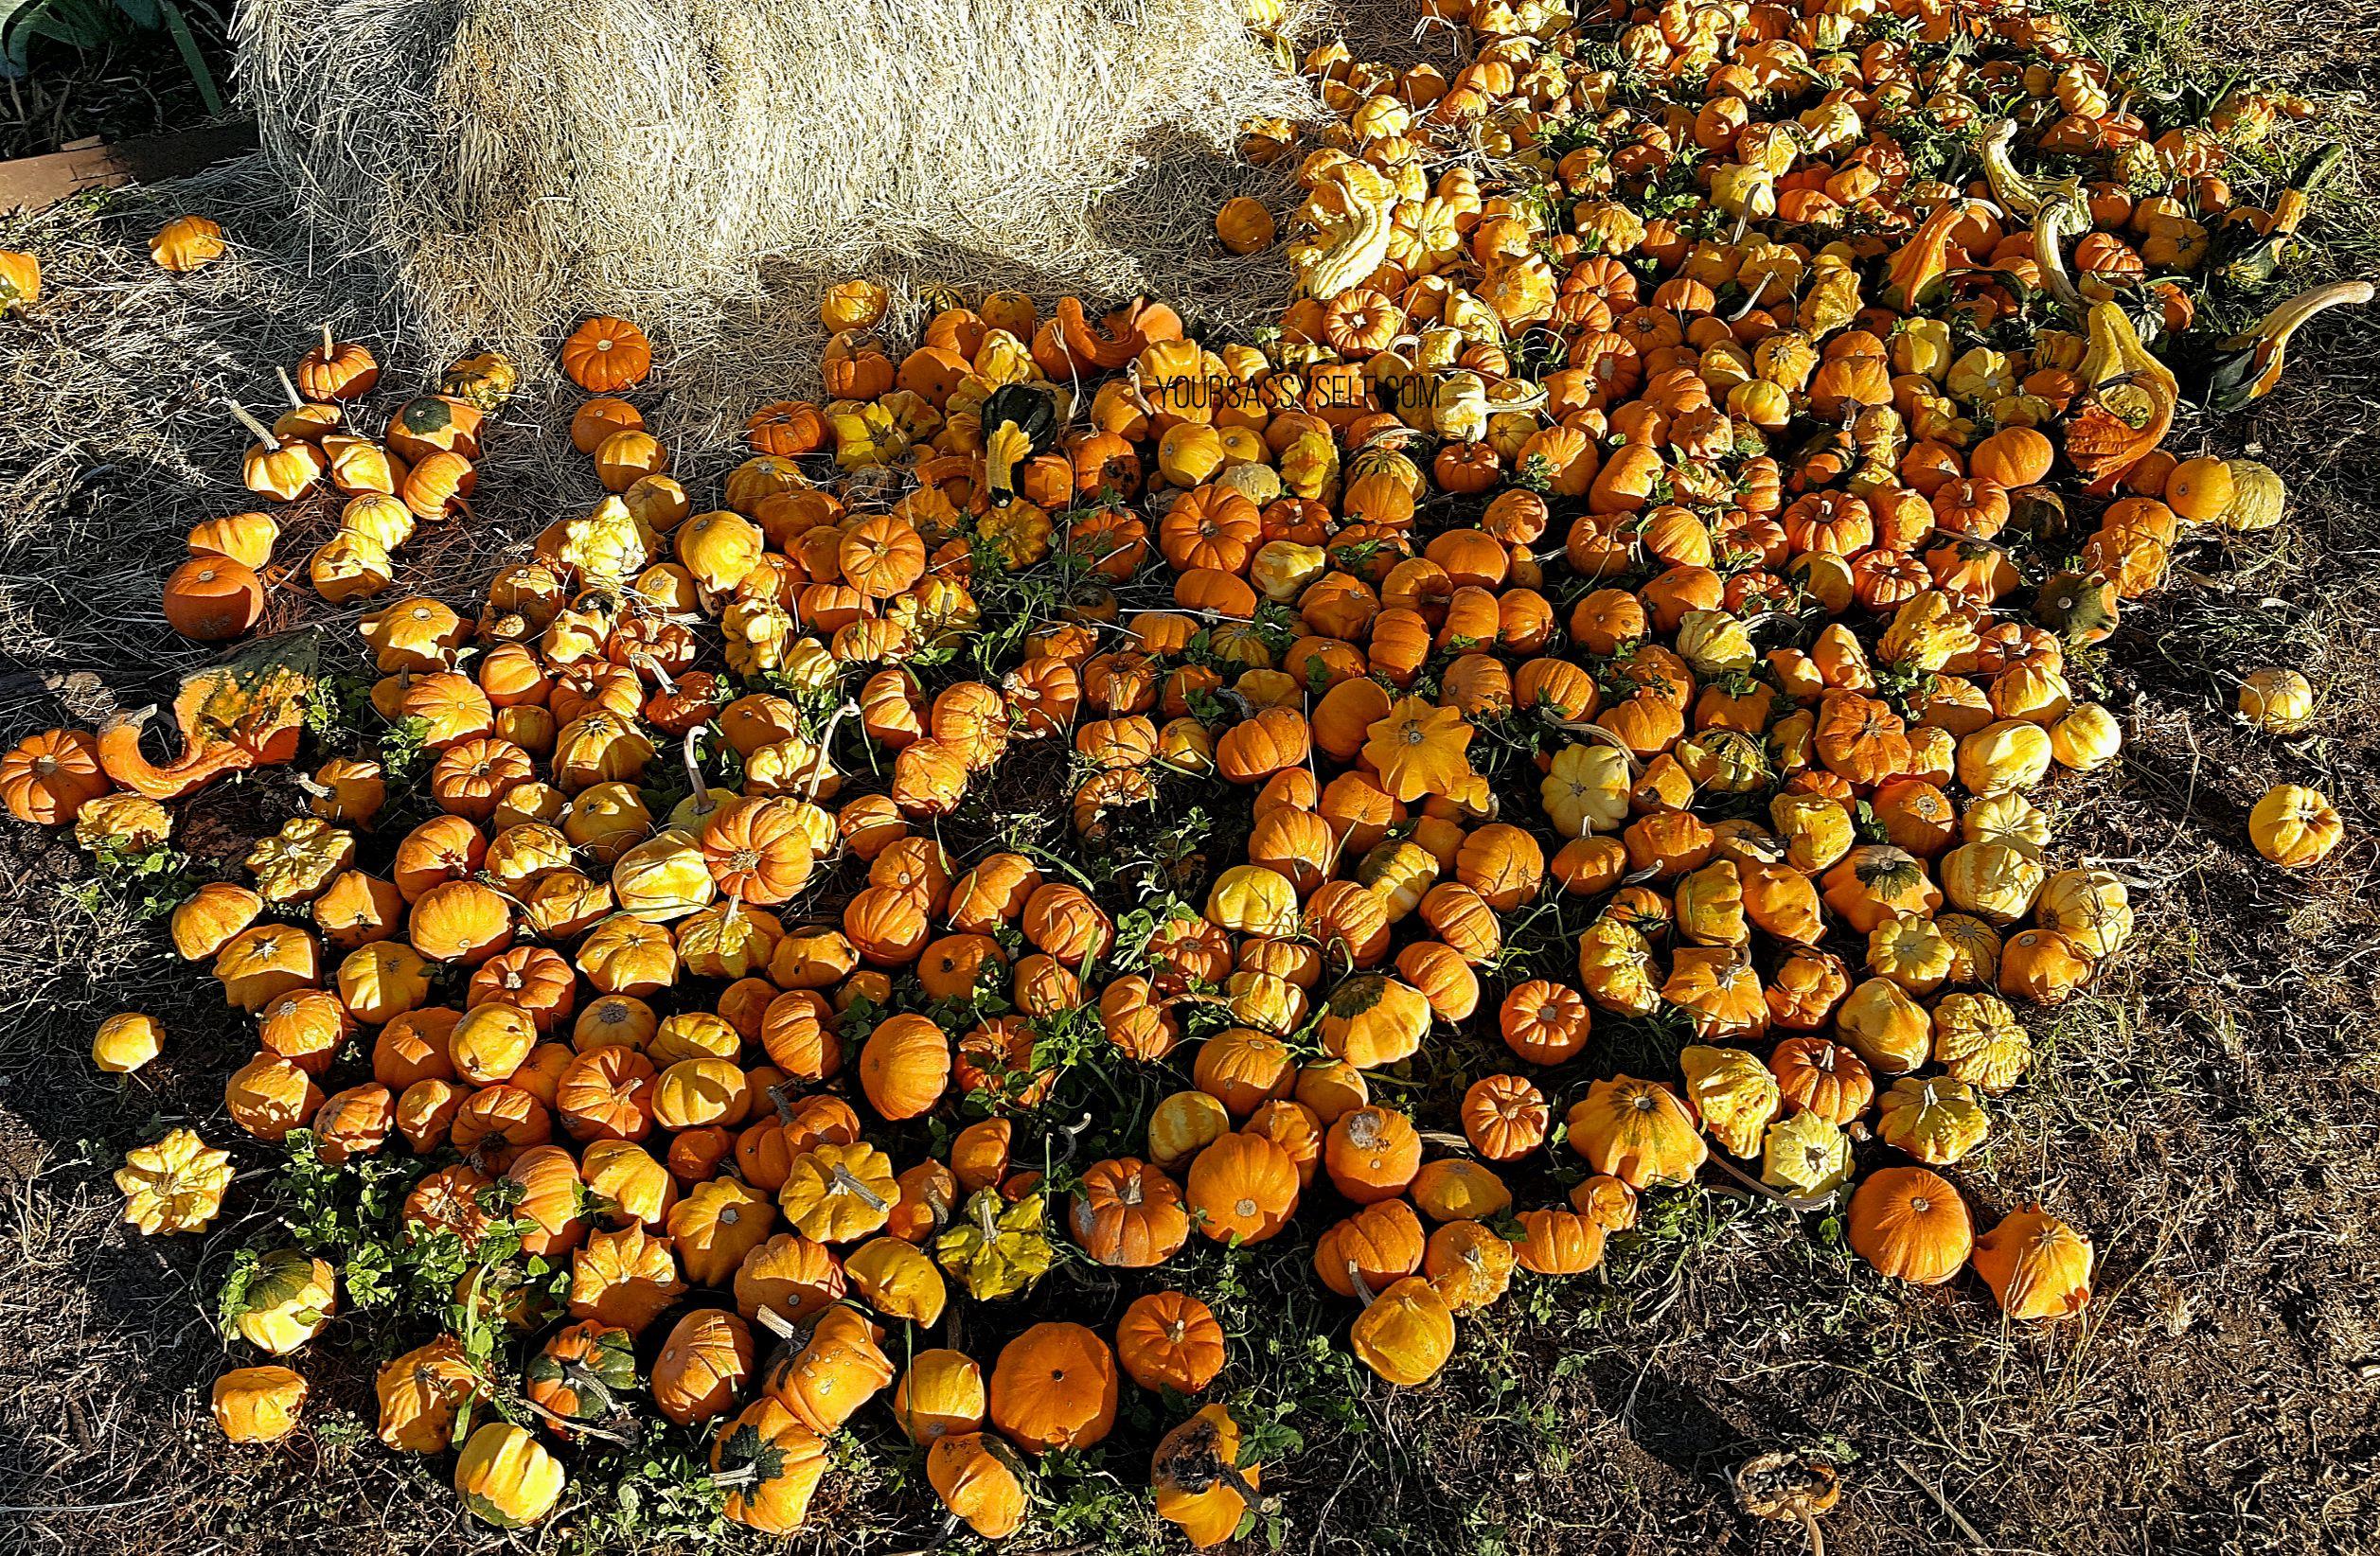 Pumpkin Patch - yoursassyselfcom